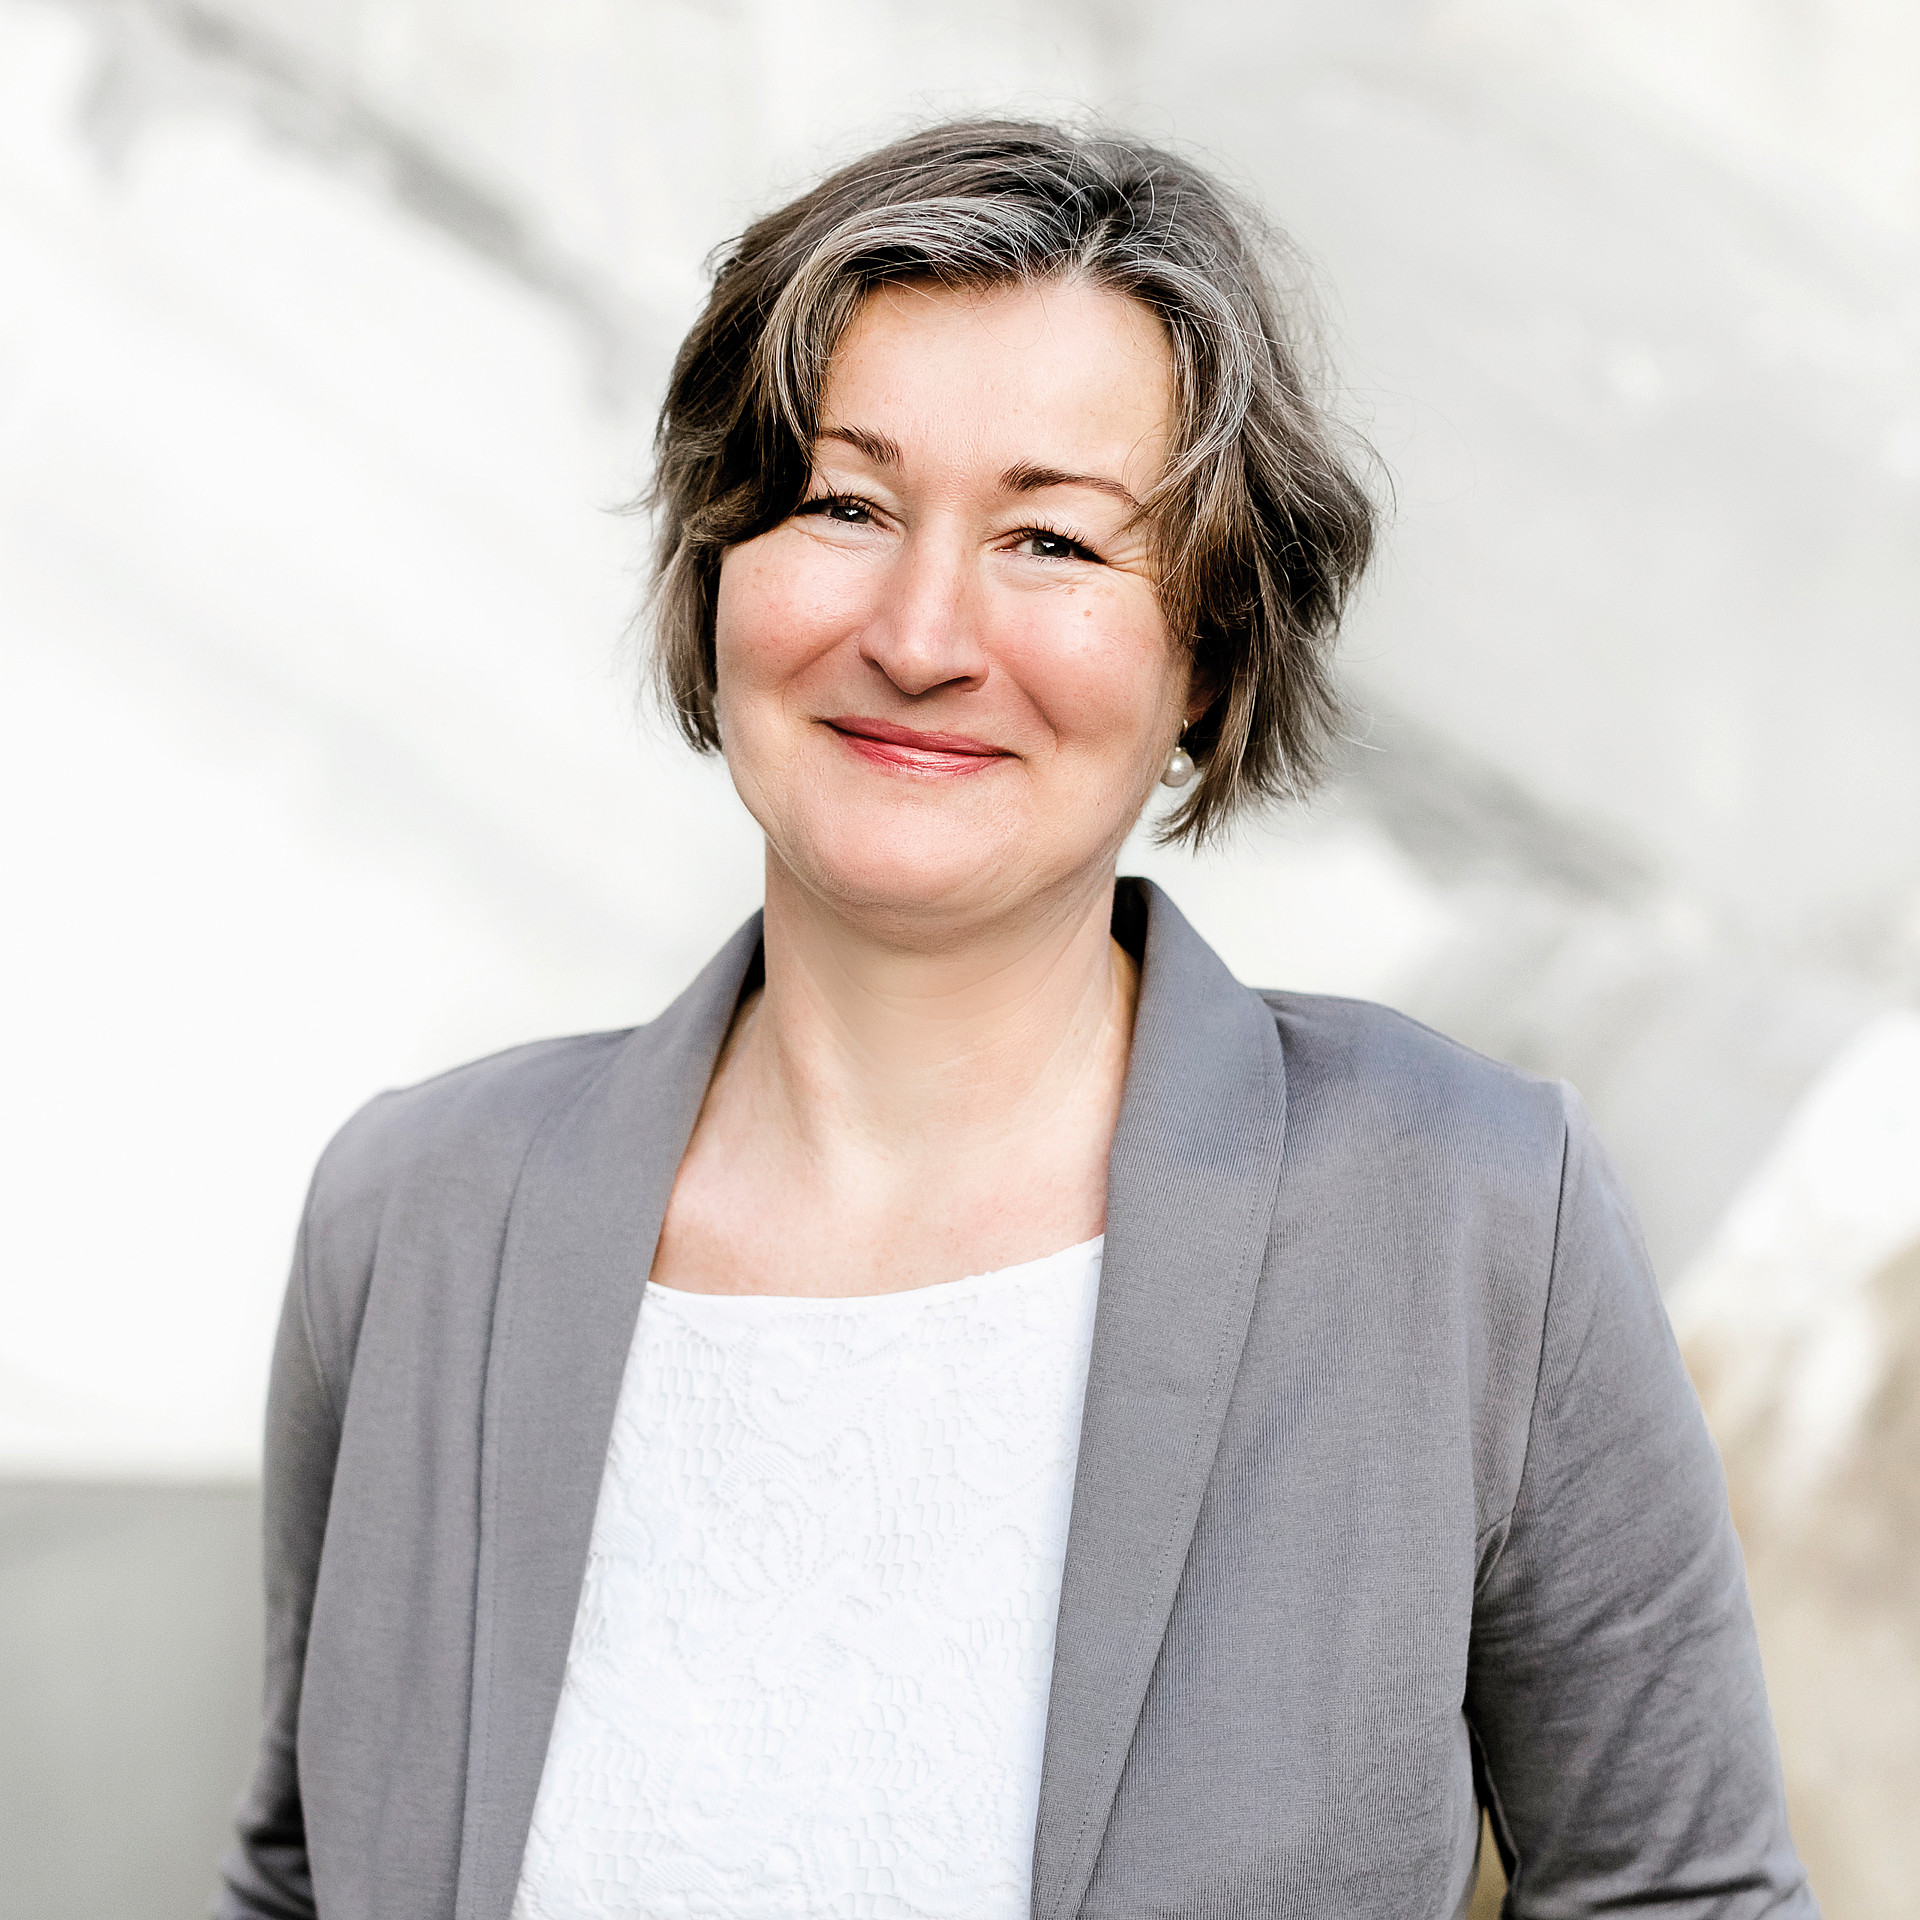 Elisabeth Kraxner